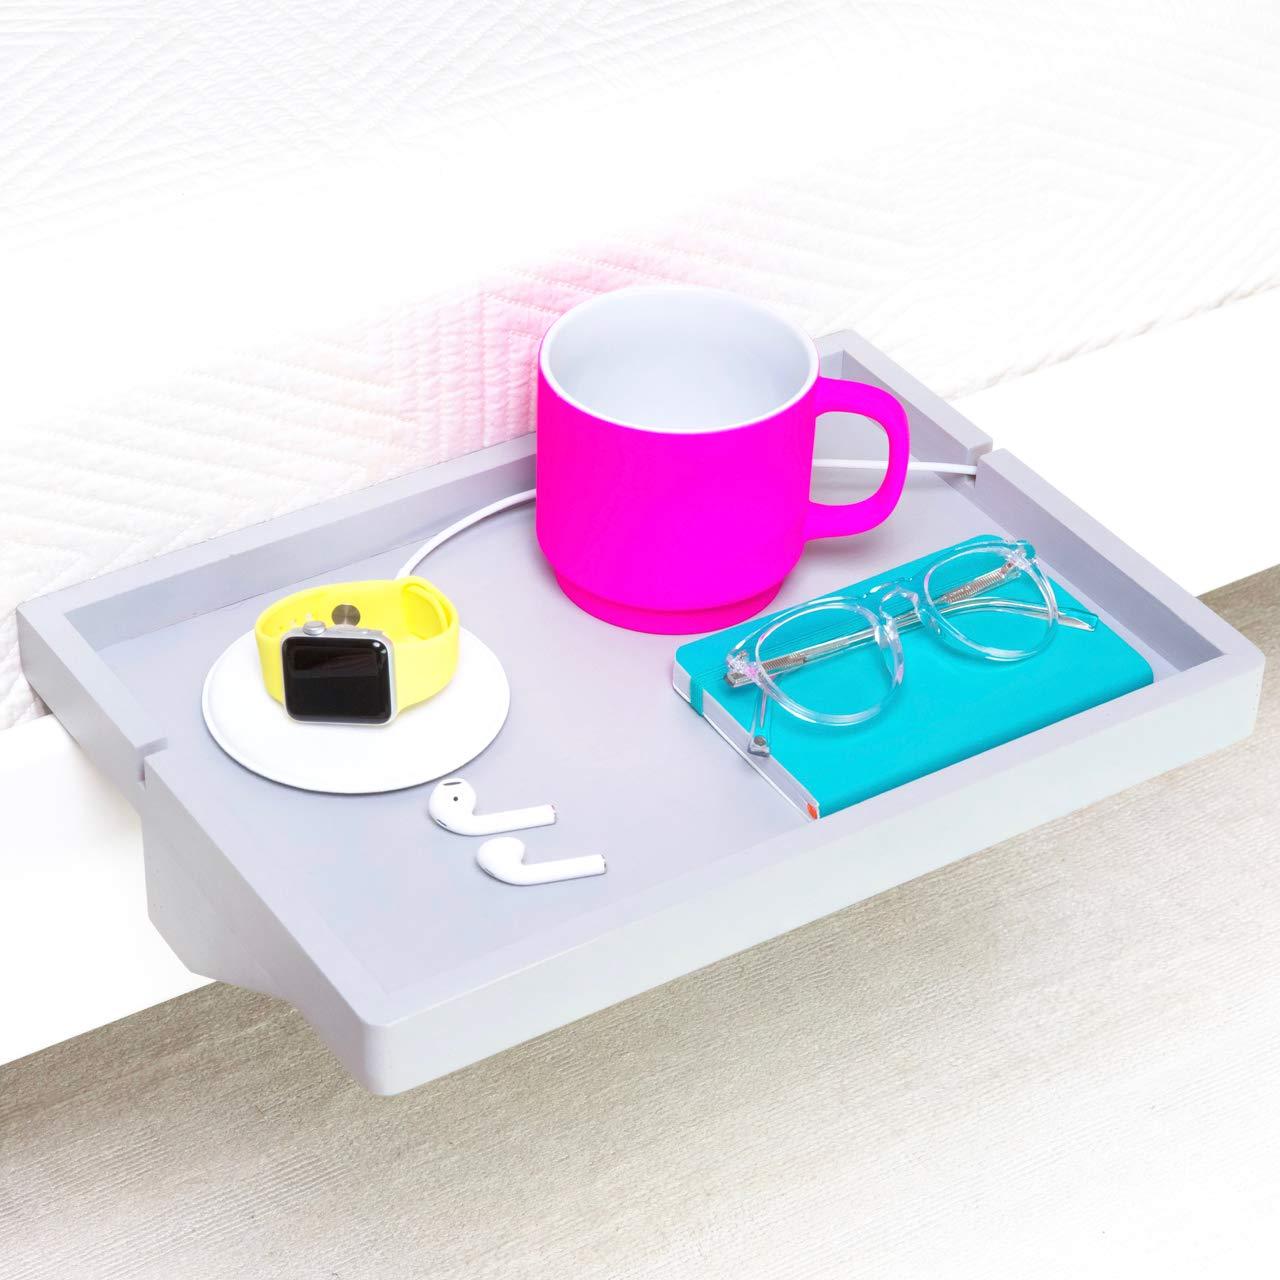 BedShelfie The Original Bedside Shelf - 9 Colors / 2 Sizes - AS SEEN ON Business Insider (Regular Size, Bamboo in Light Grey)